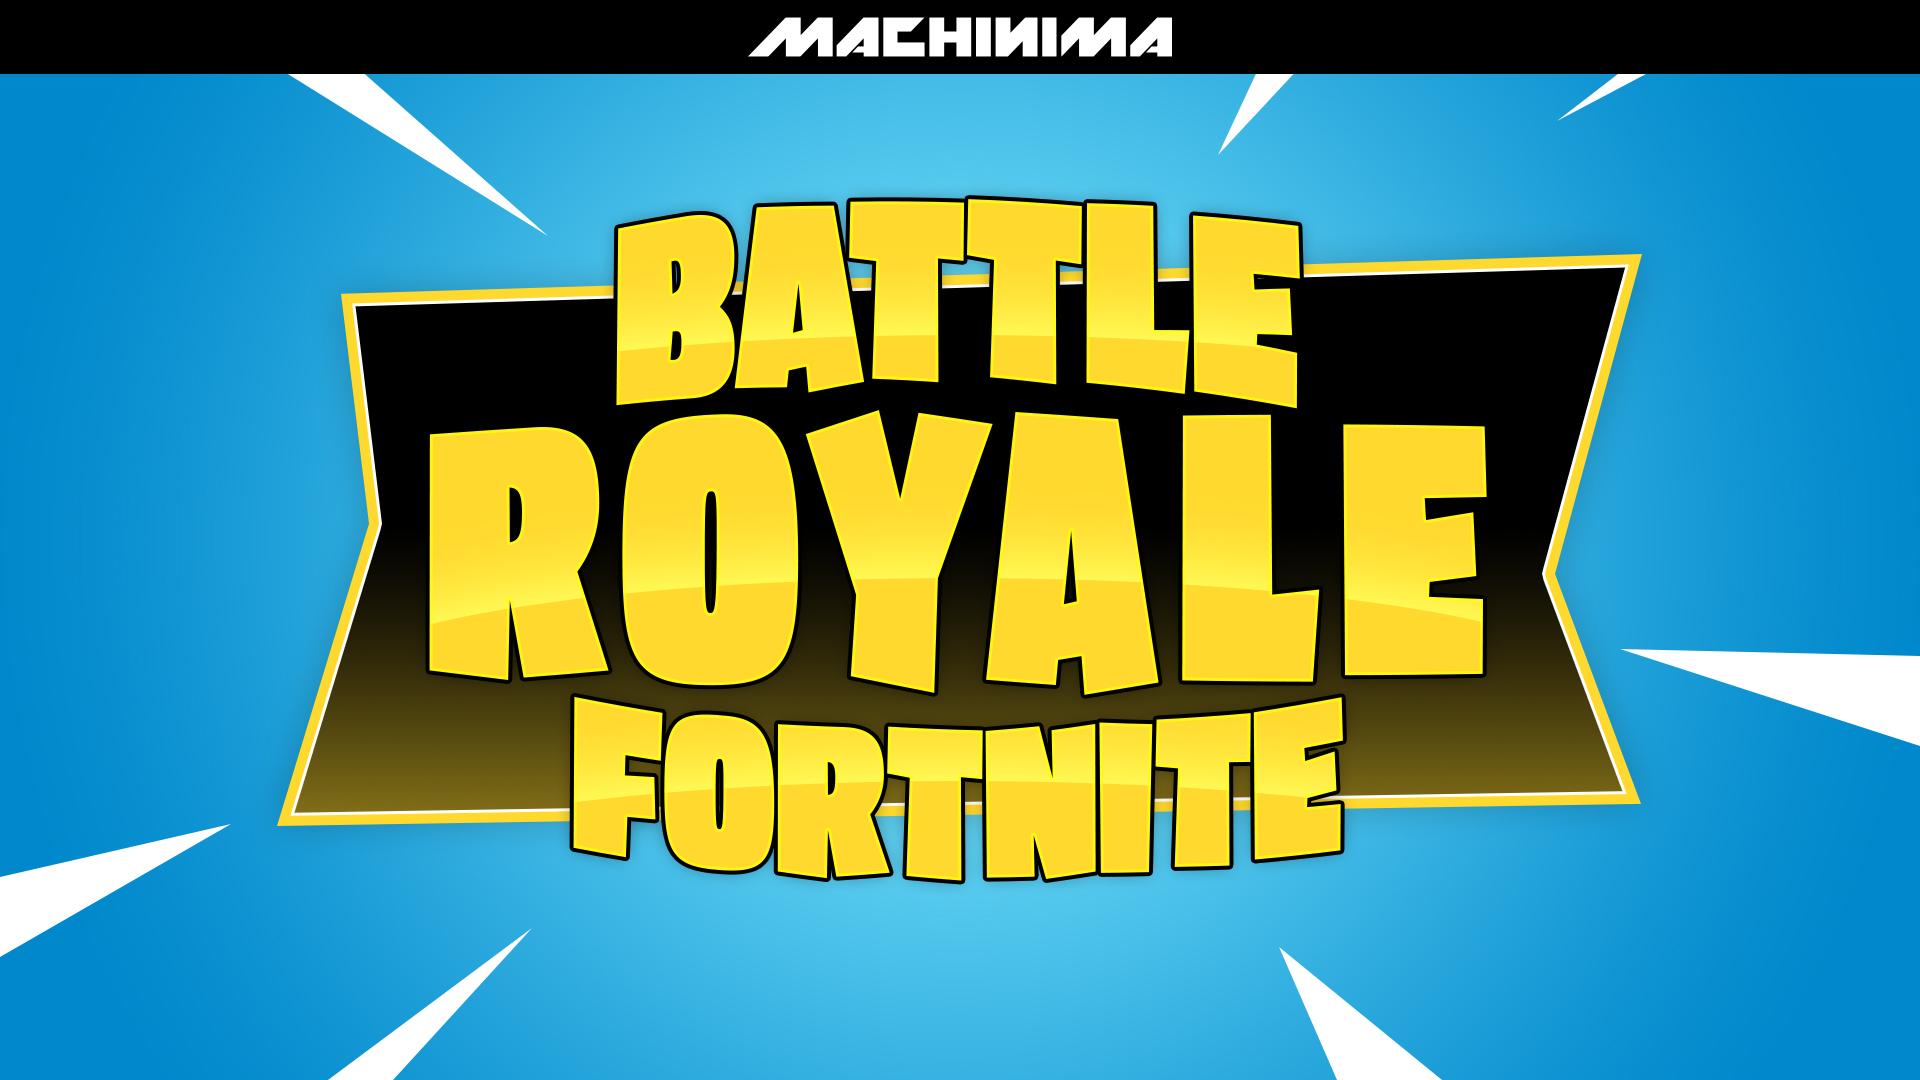 Watch Clip: Fortnite Battle Royale Wins (Sigils) | Prime Video